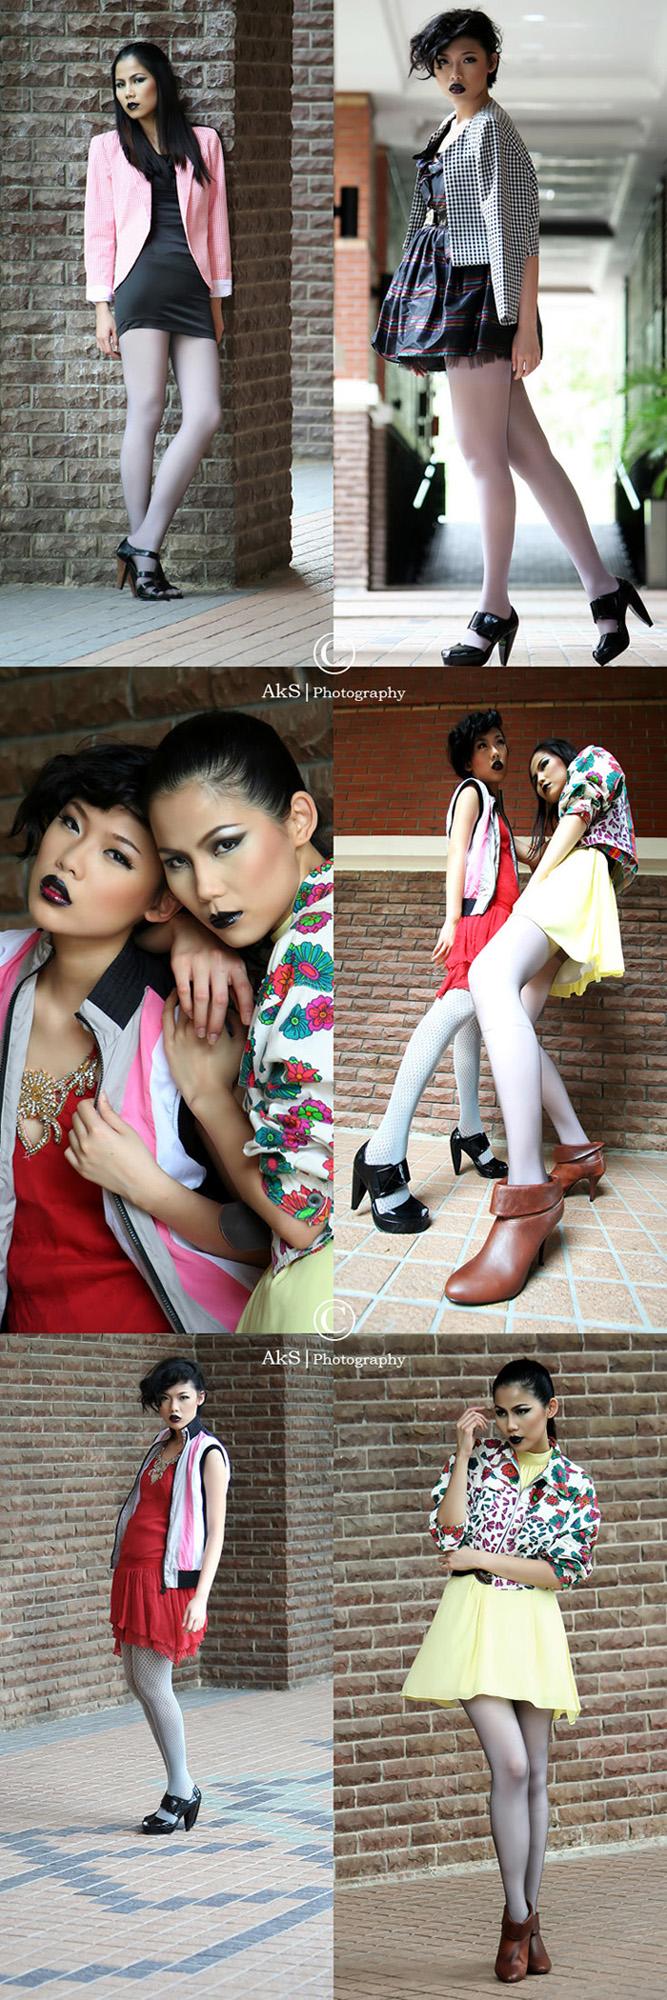 Putajaya - Malaysia May 01, 2009 Models: Shir & San, MUA: Rany, Fashion Stylist: Alicia